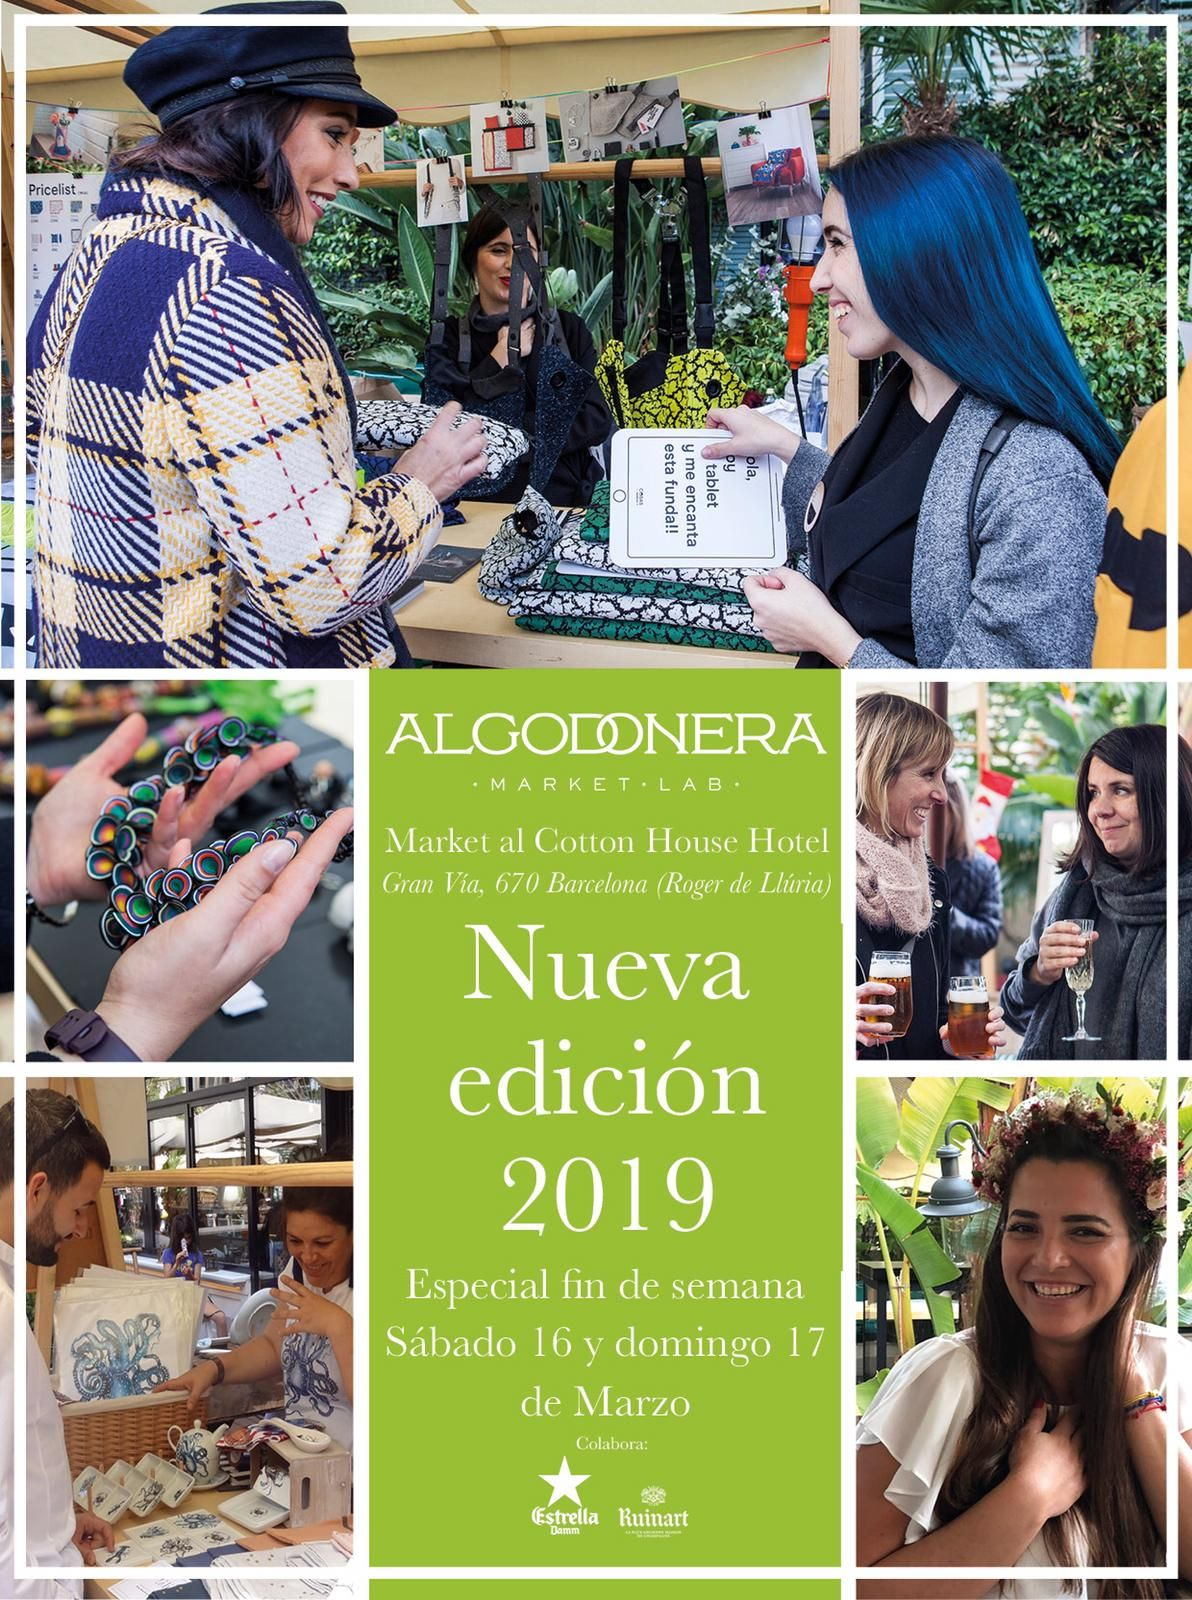 Fotografia Lo último de Rioja en La Algodonera Market Lab